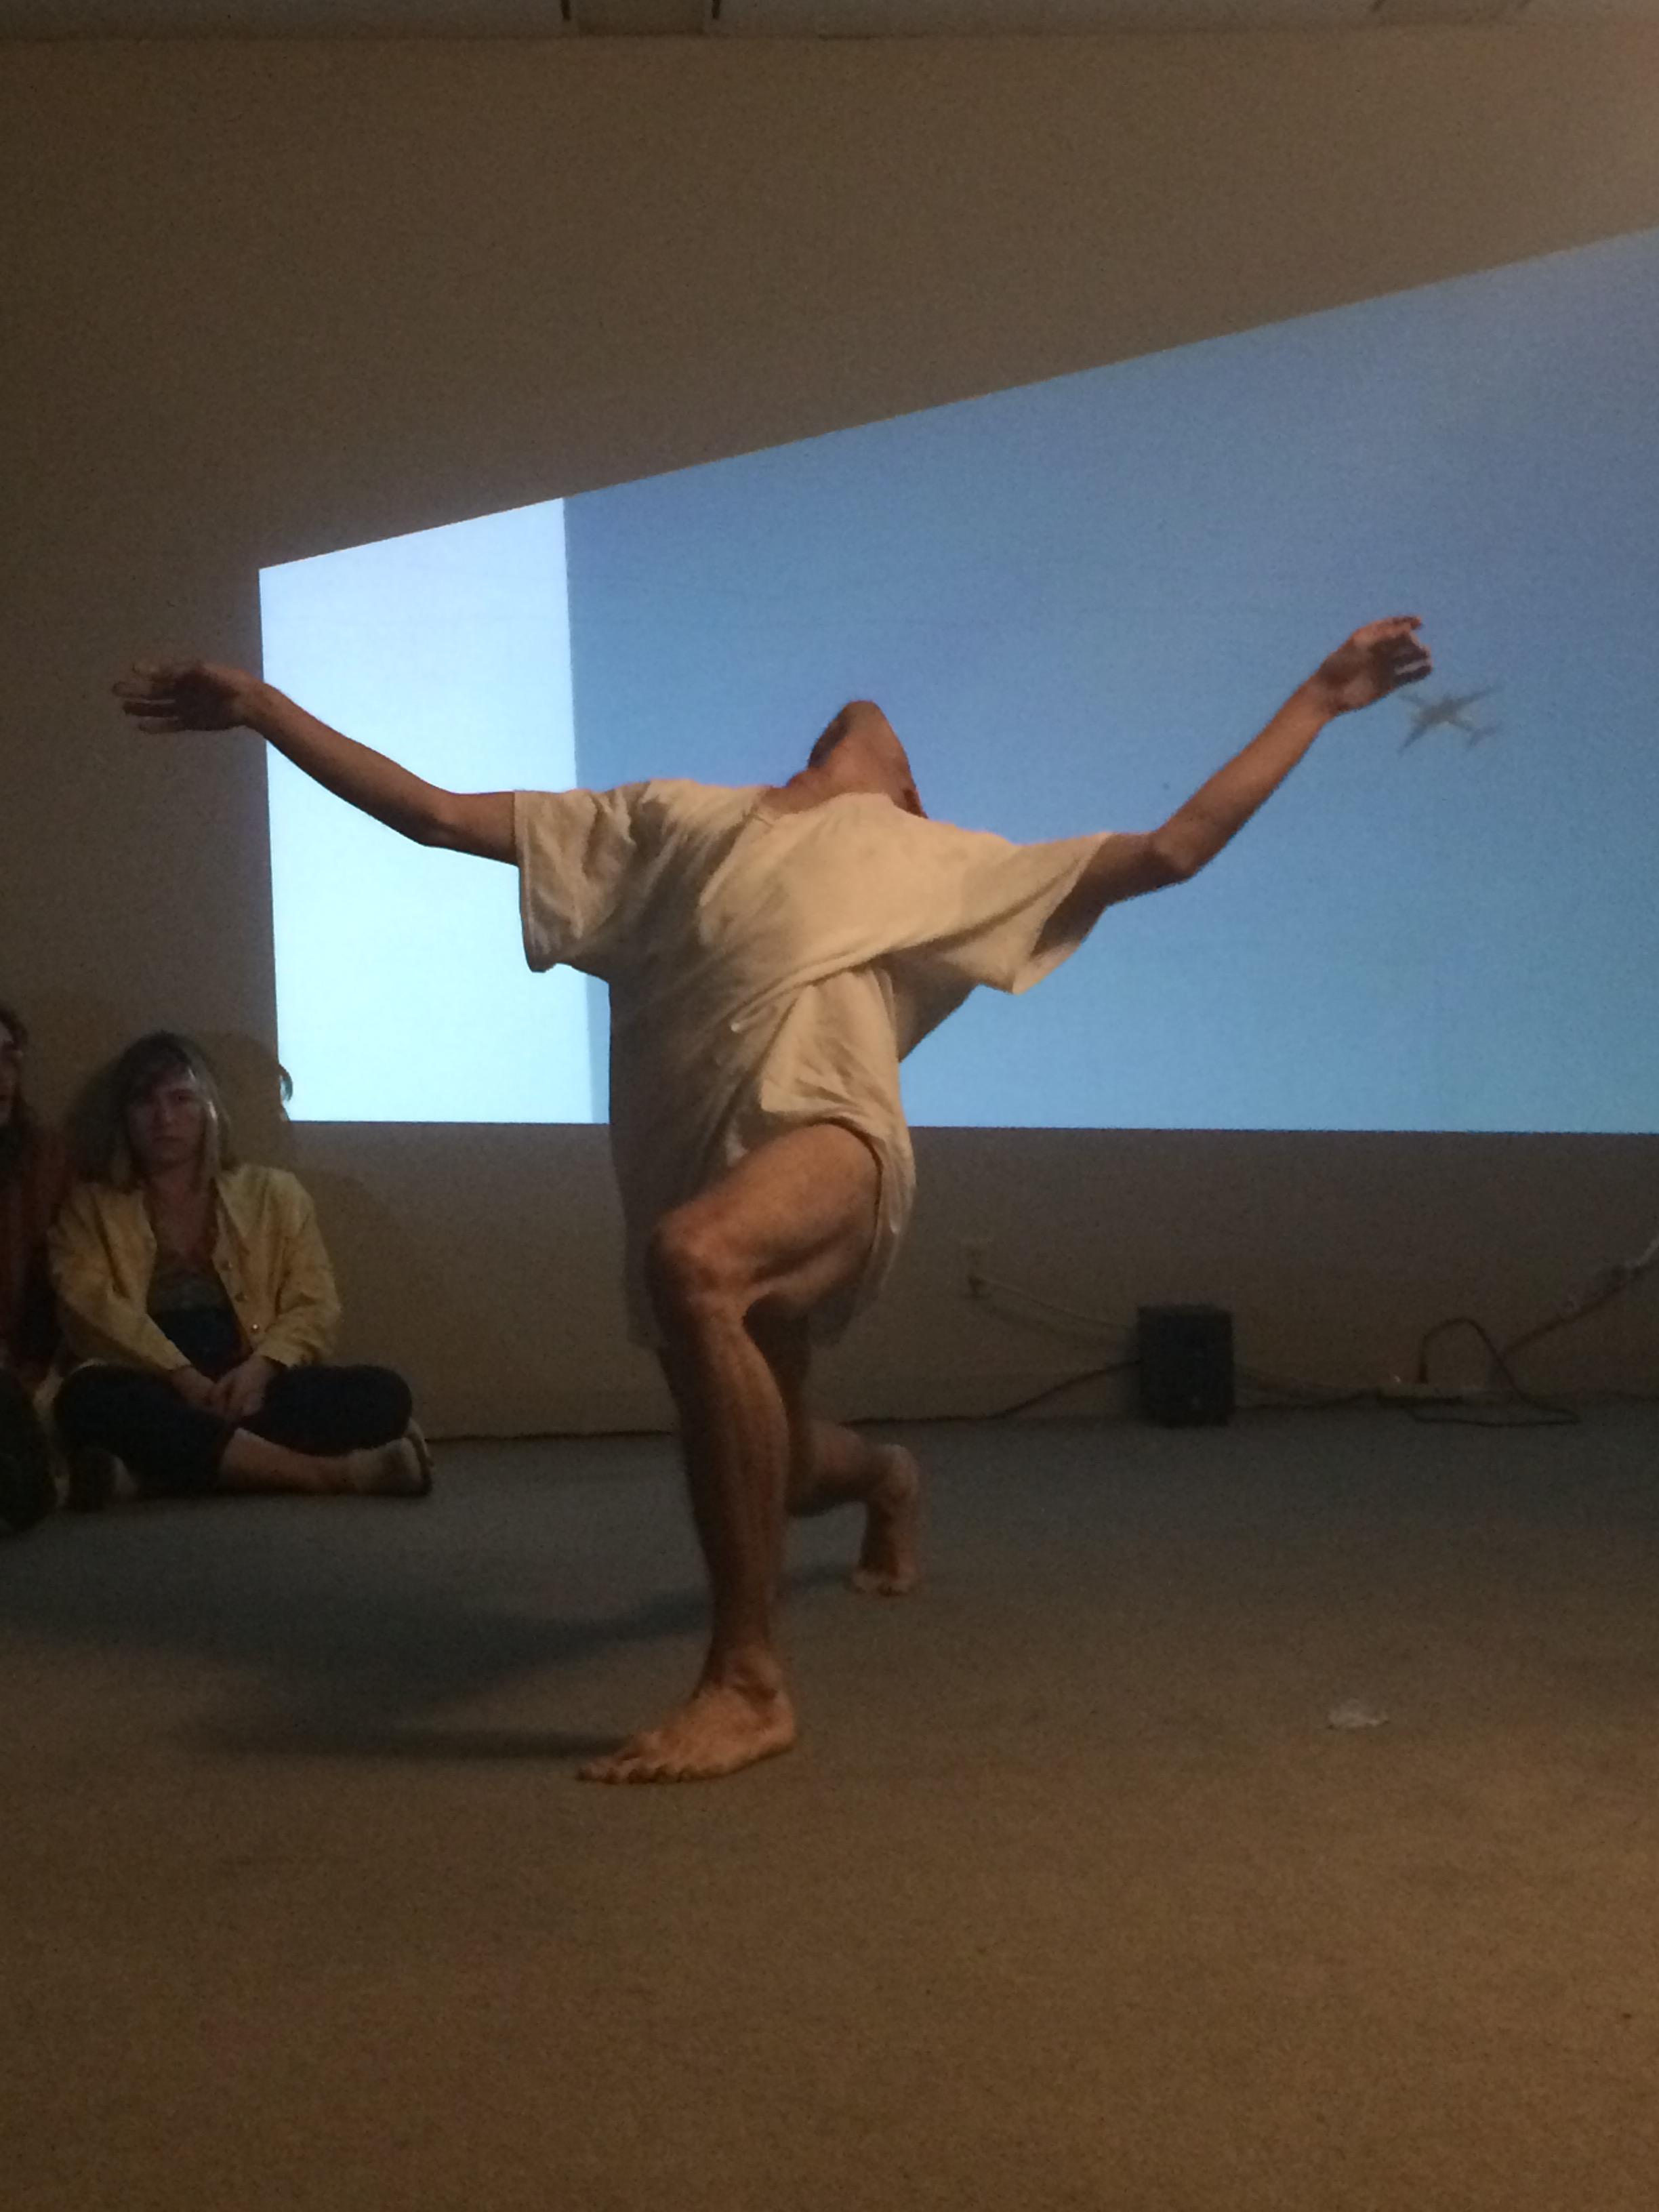 Jos McKain, performance documentation